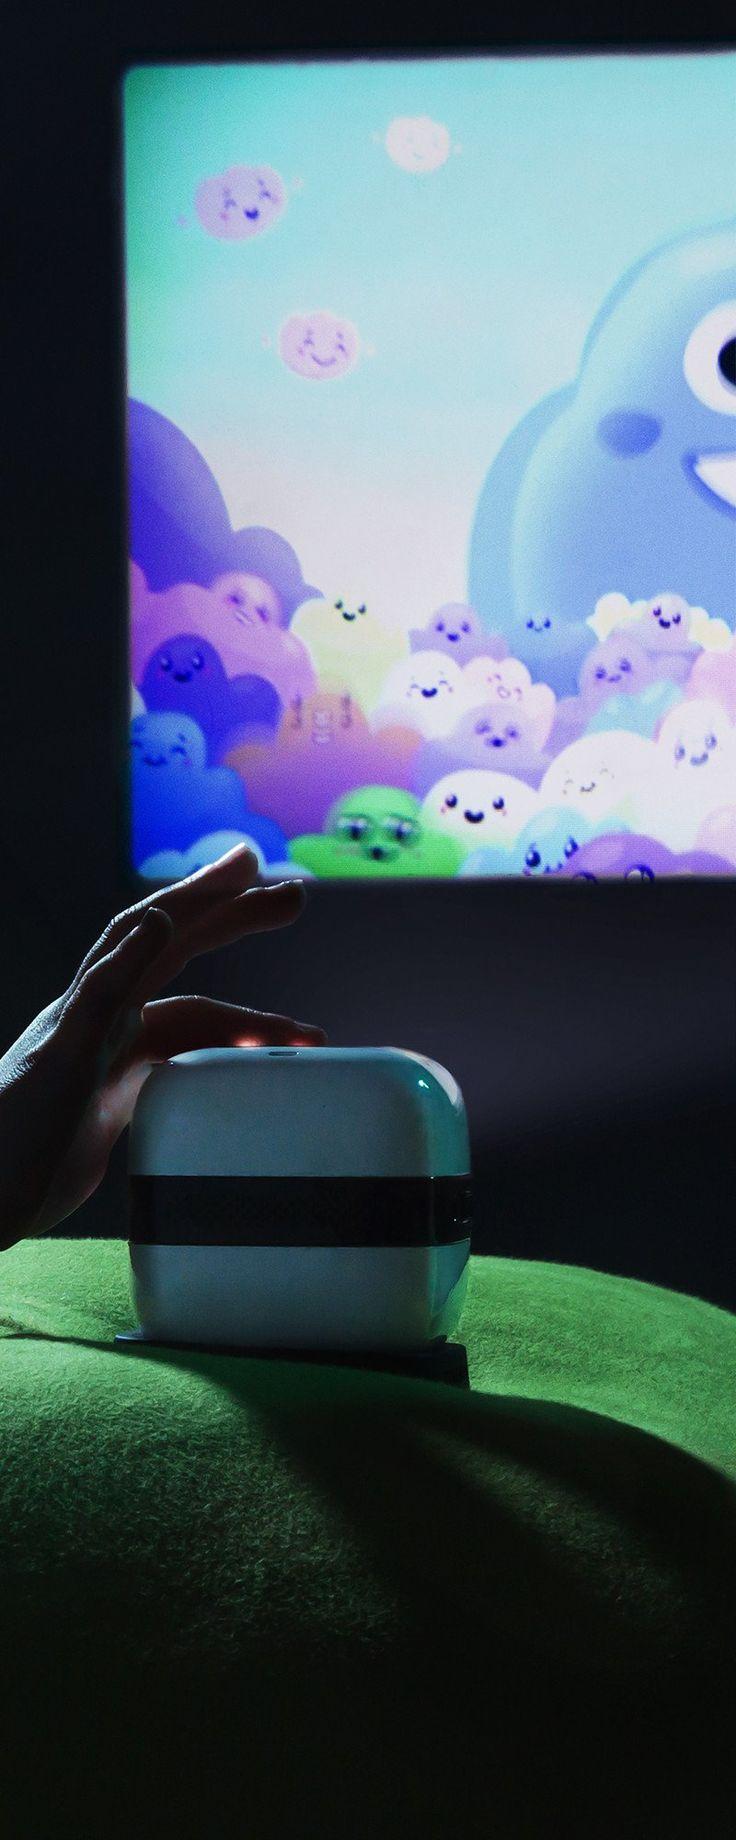 Cinemood: Handheld Cinema Projector